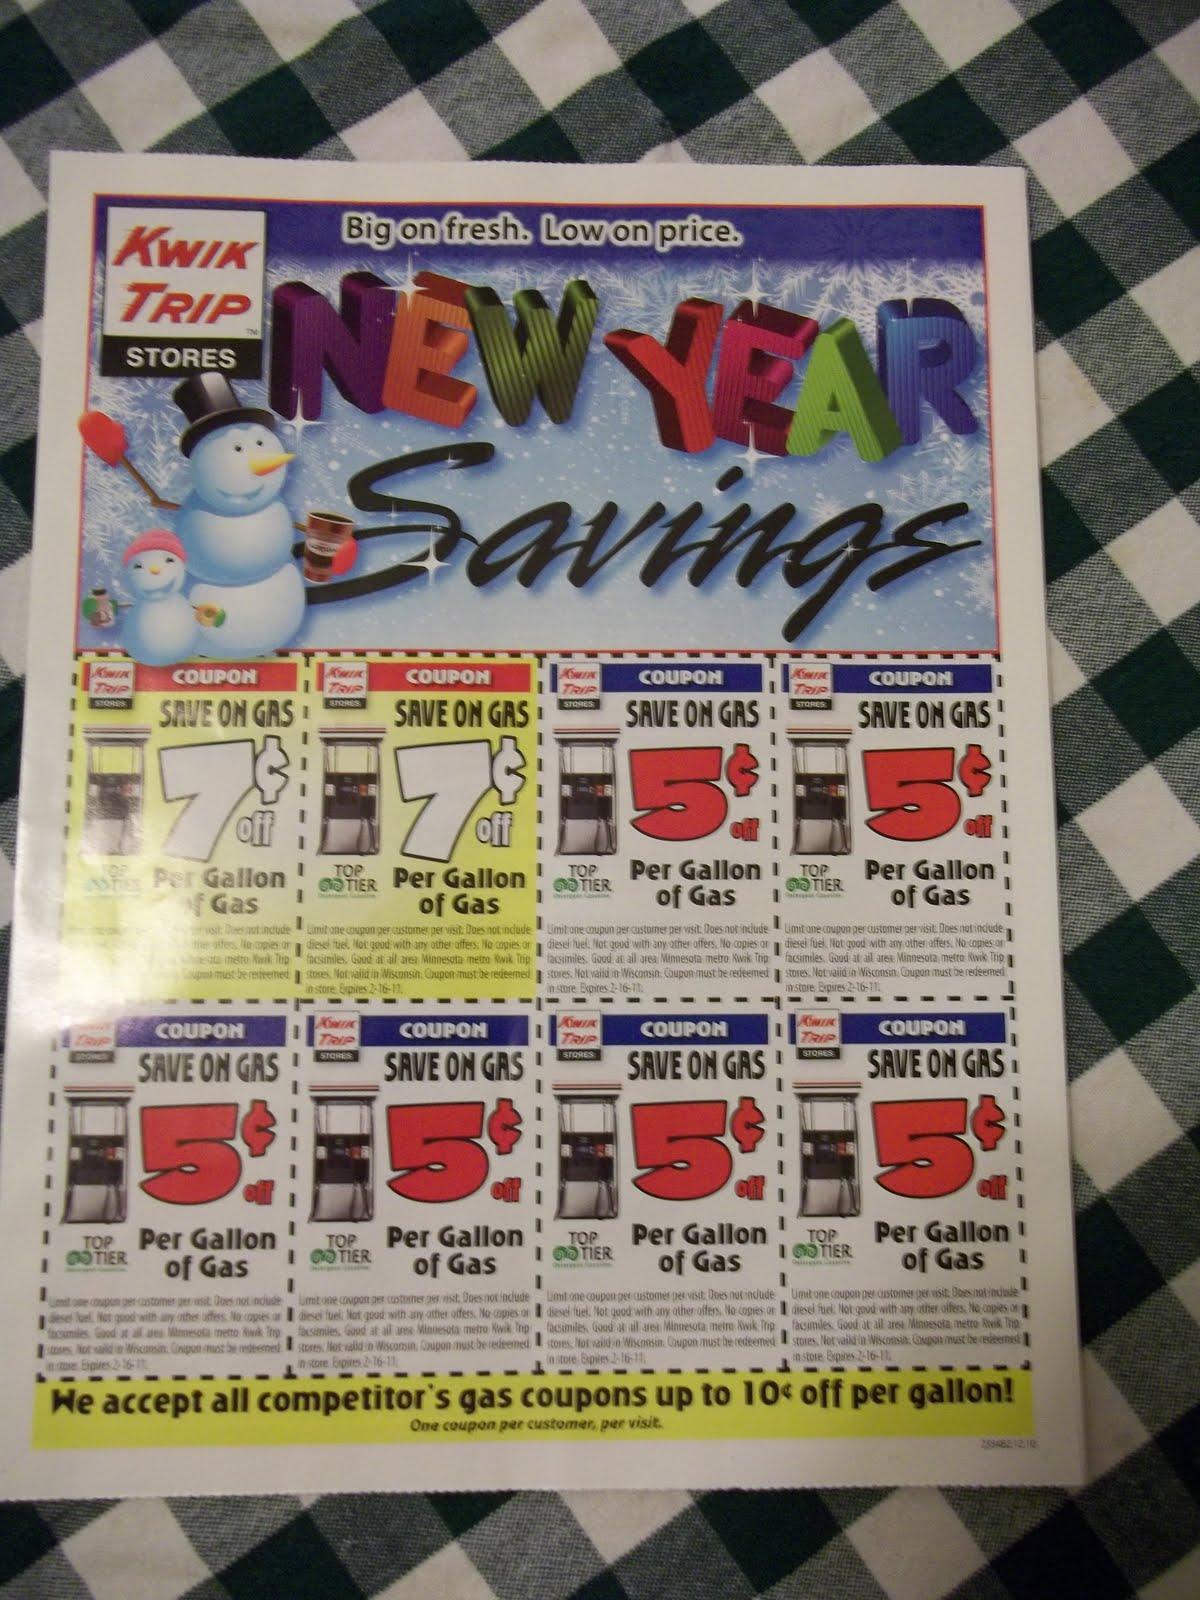 Kwik trip coupons